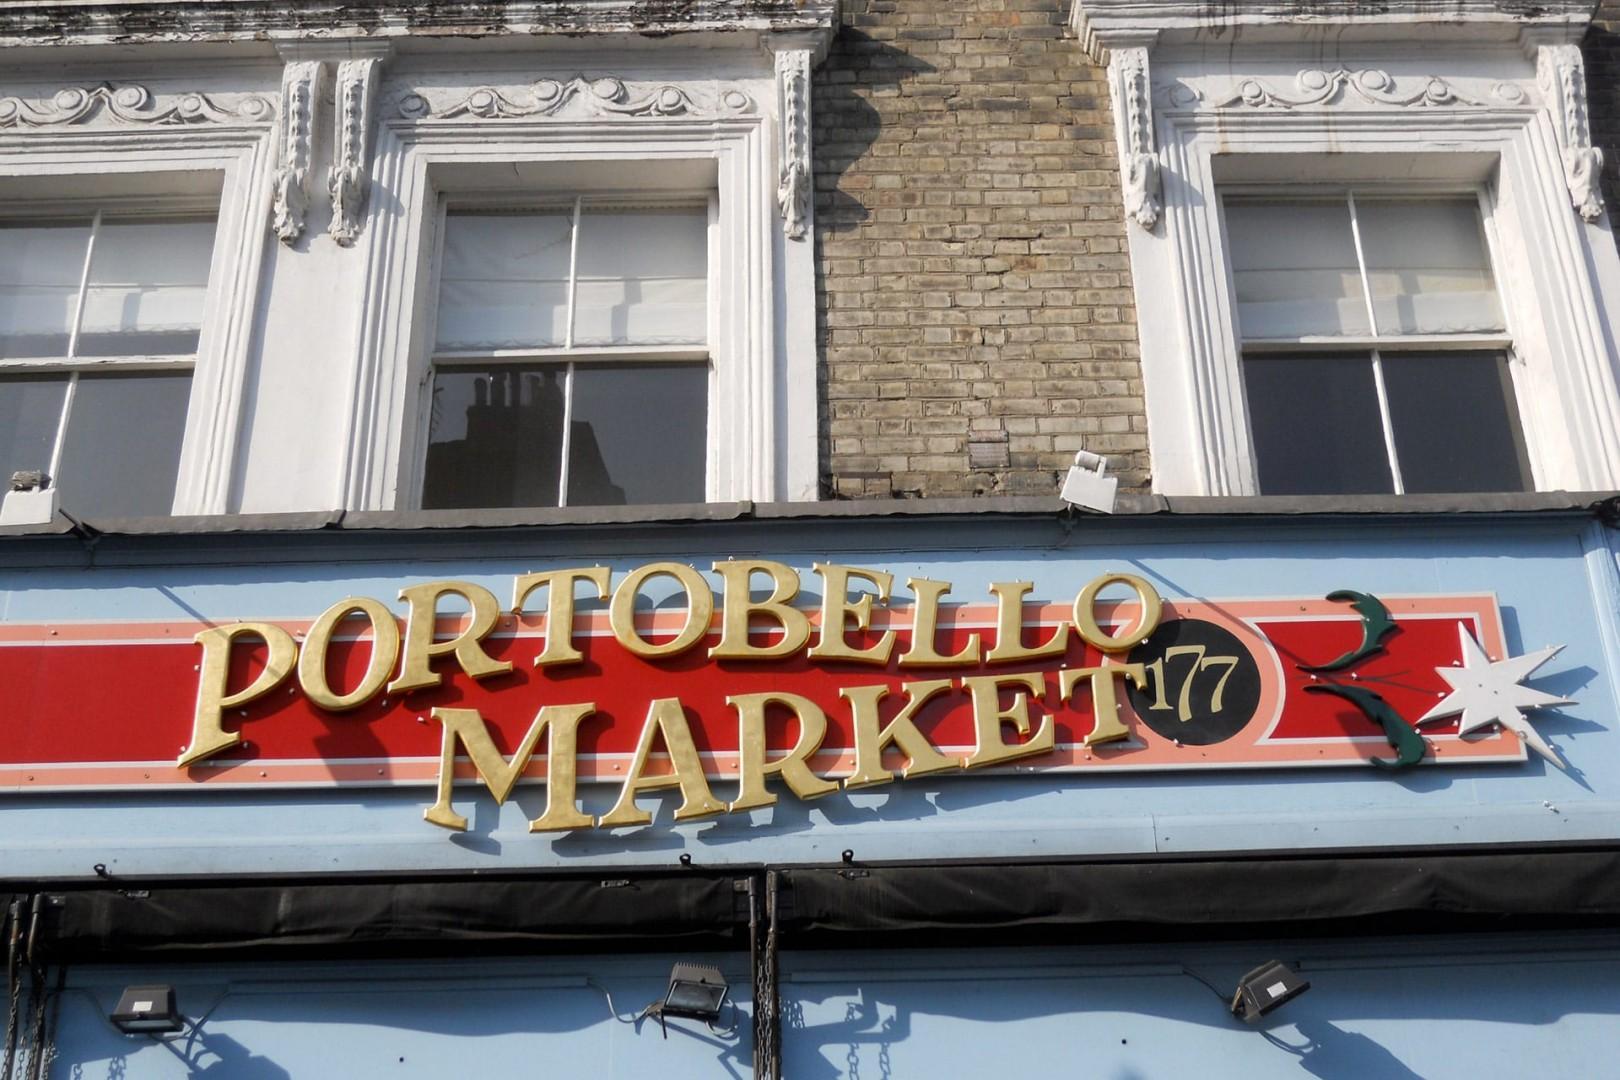 15-portobello-market-sign